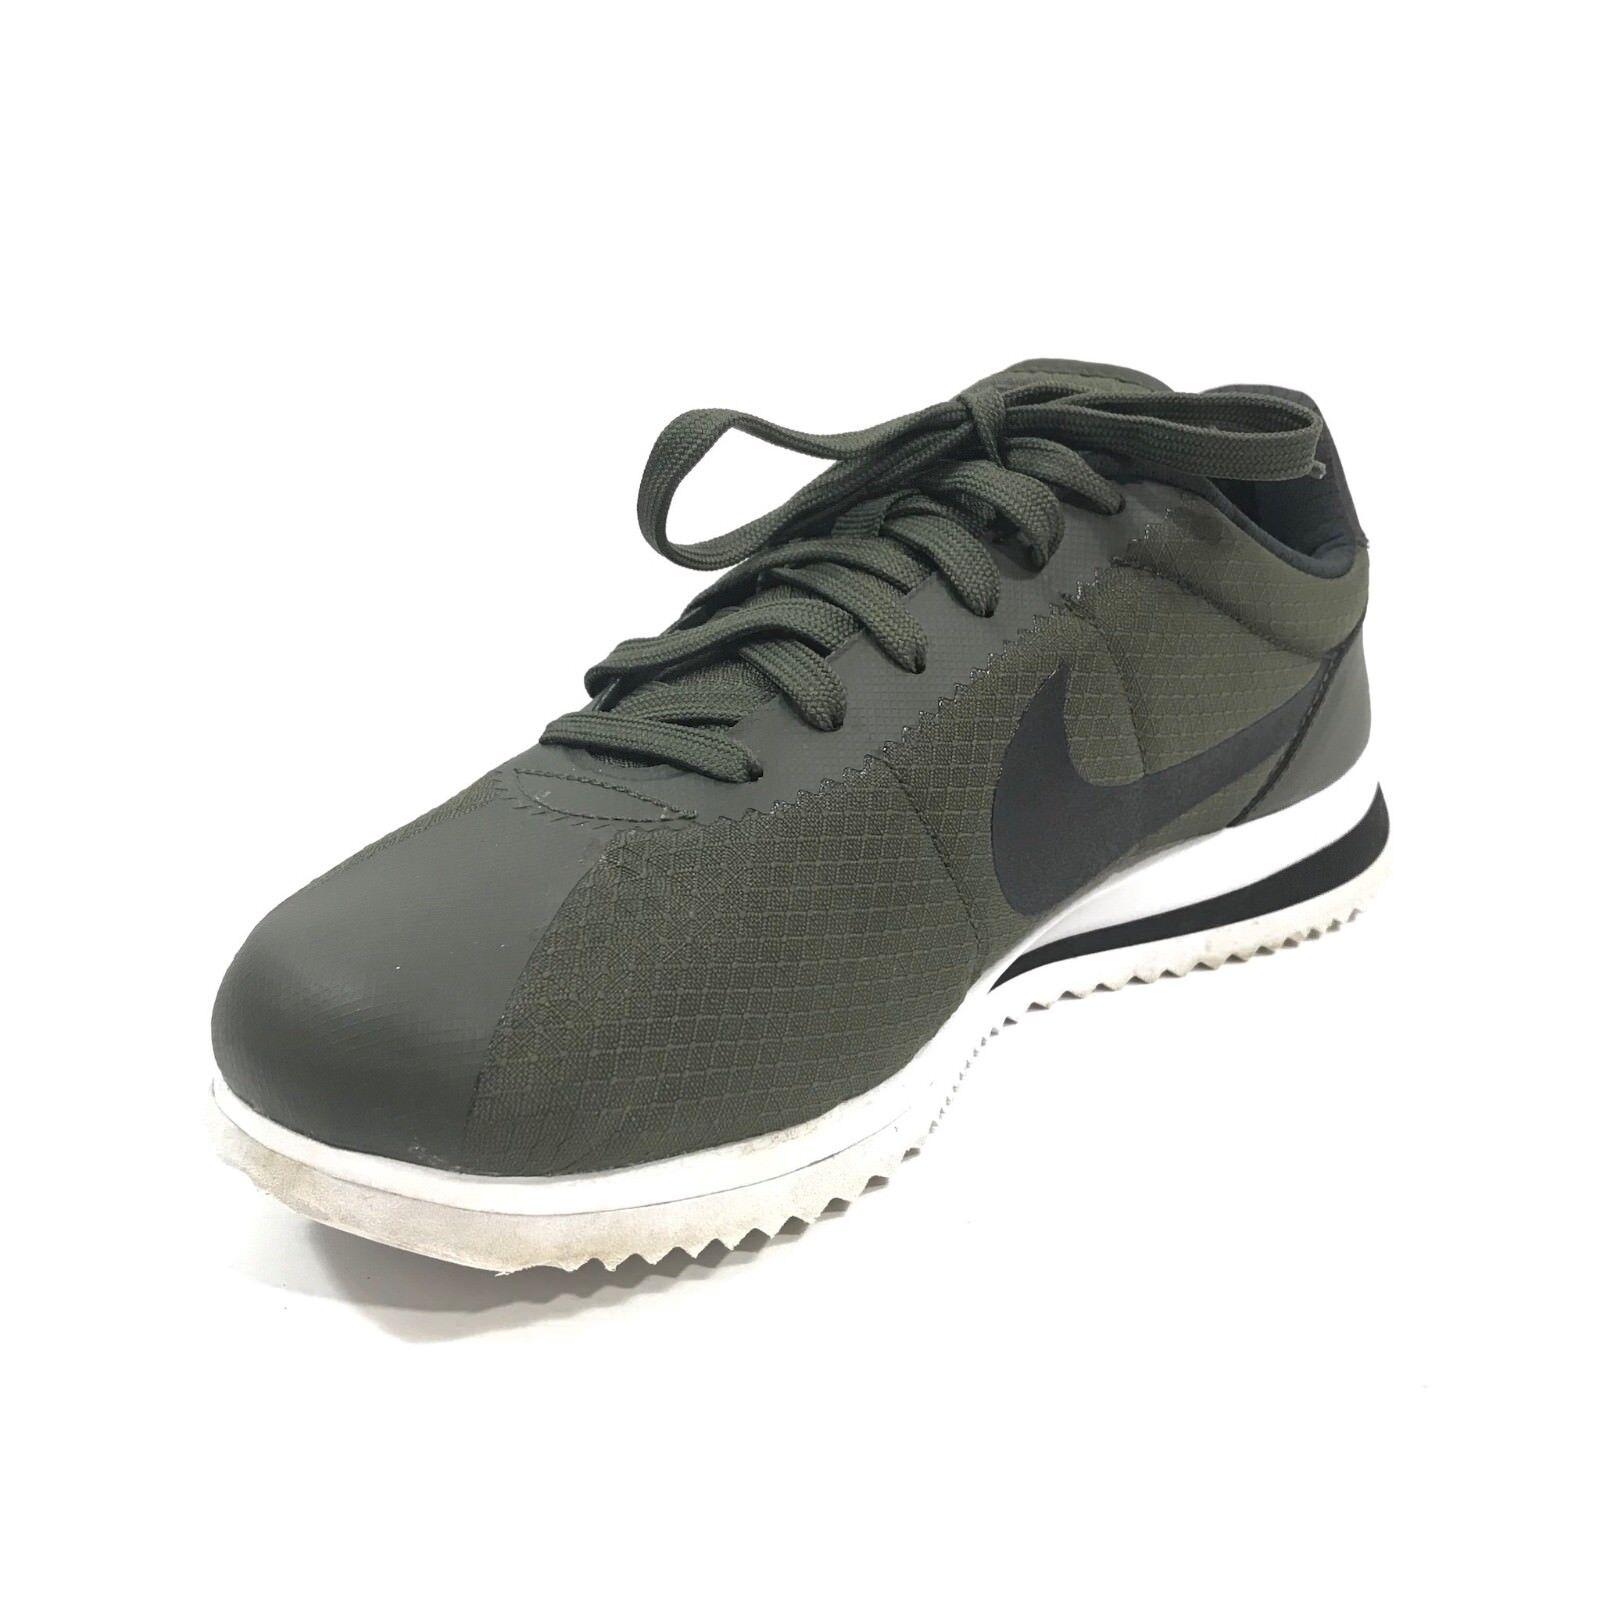 Nike Mens Cortez Casual Sneaker shoes Ultra Cargo Khaki Black Sz 8 833142-300